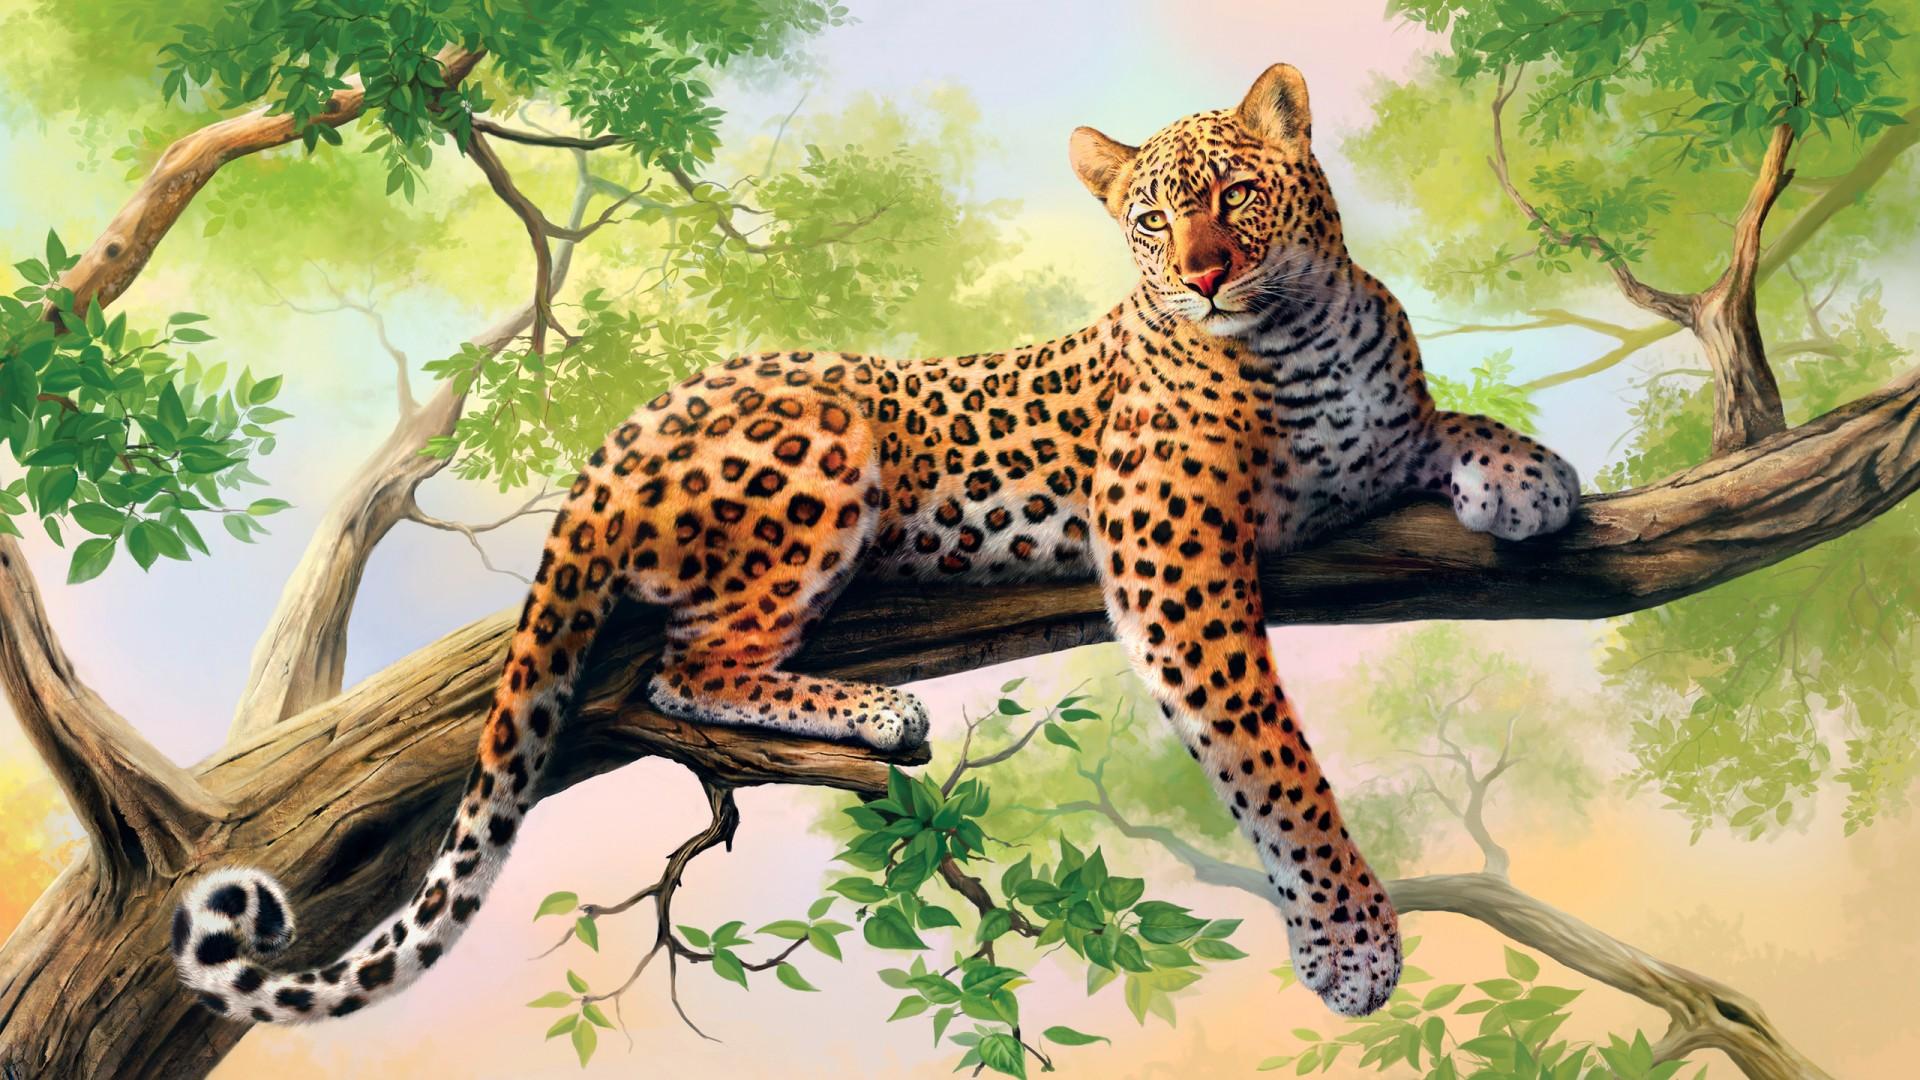 Latest Sports Cars 2014 Wallpaper Leopard Art Wallpapers Hd Wallpapers Id 13648